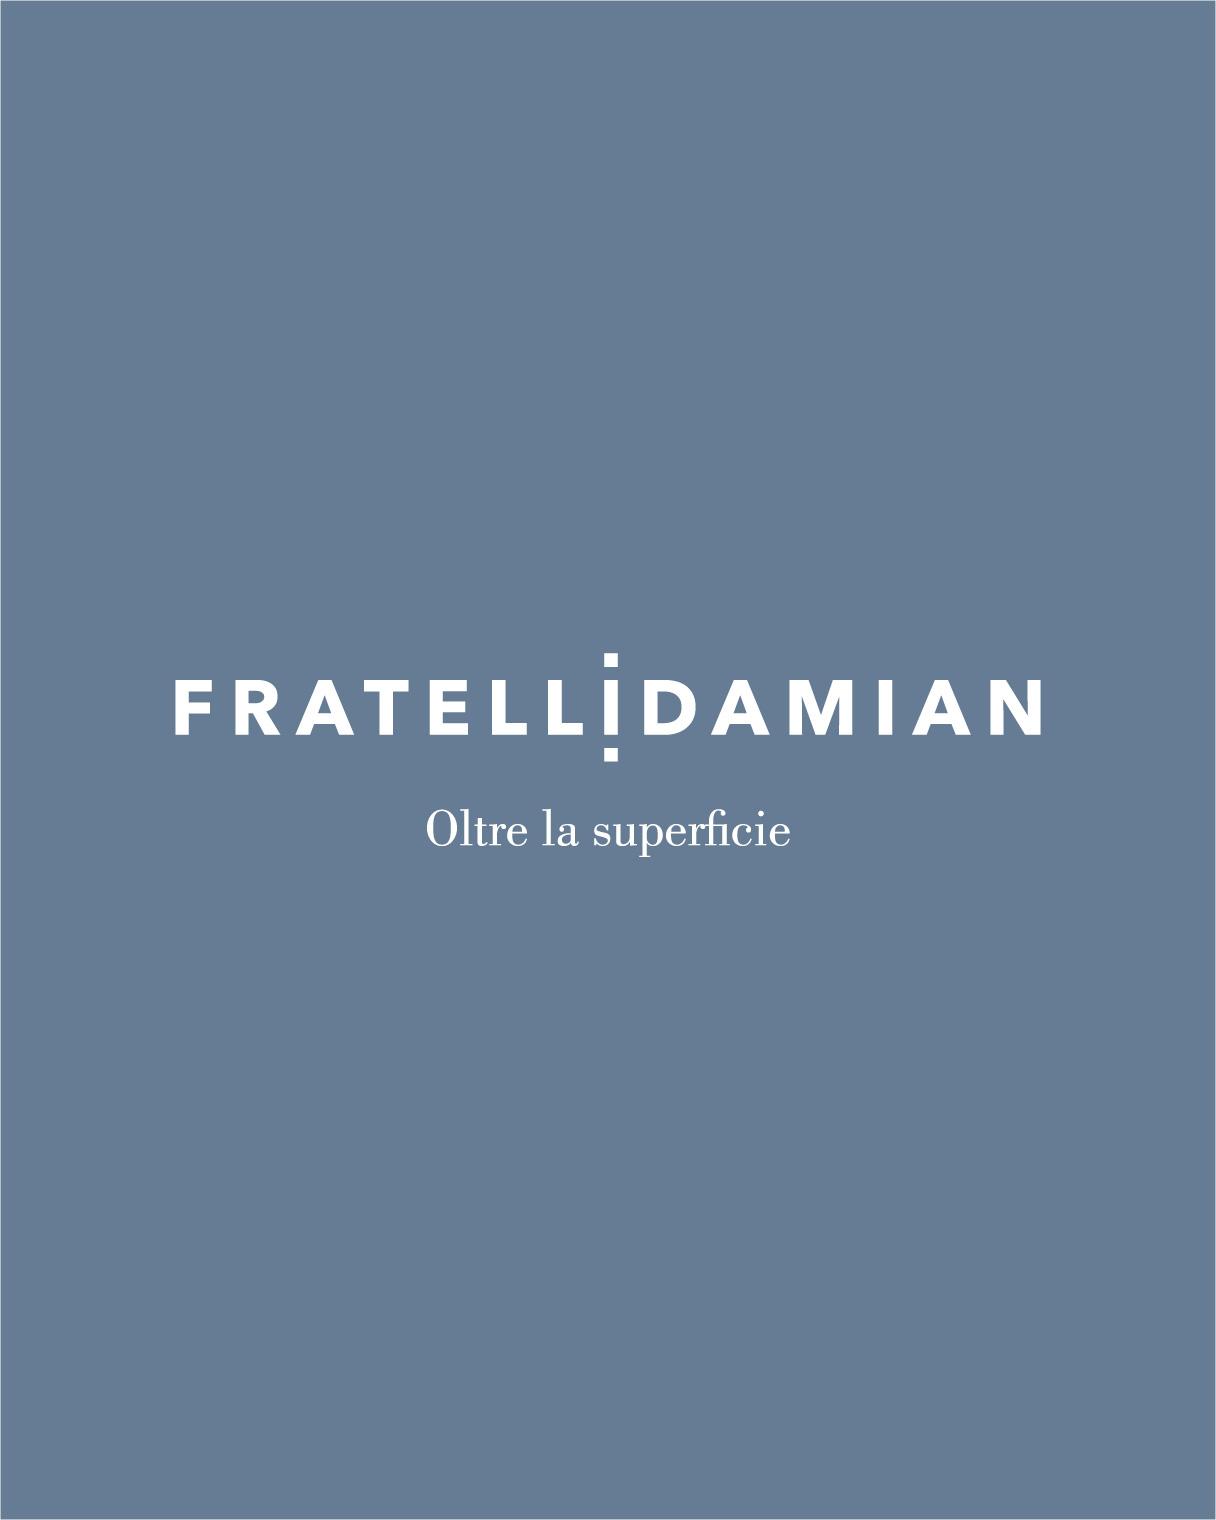 Nuovo logo Fratelli Damian | Kora Comunicazione